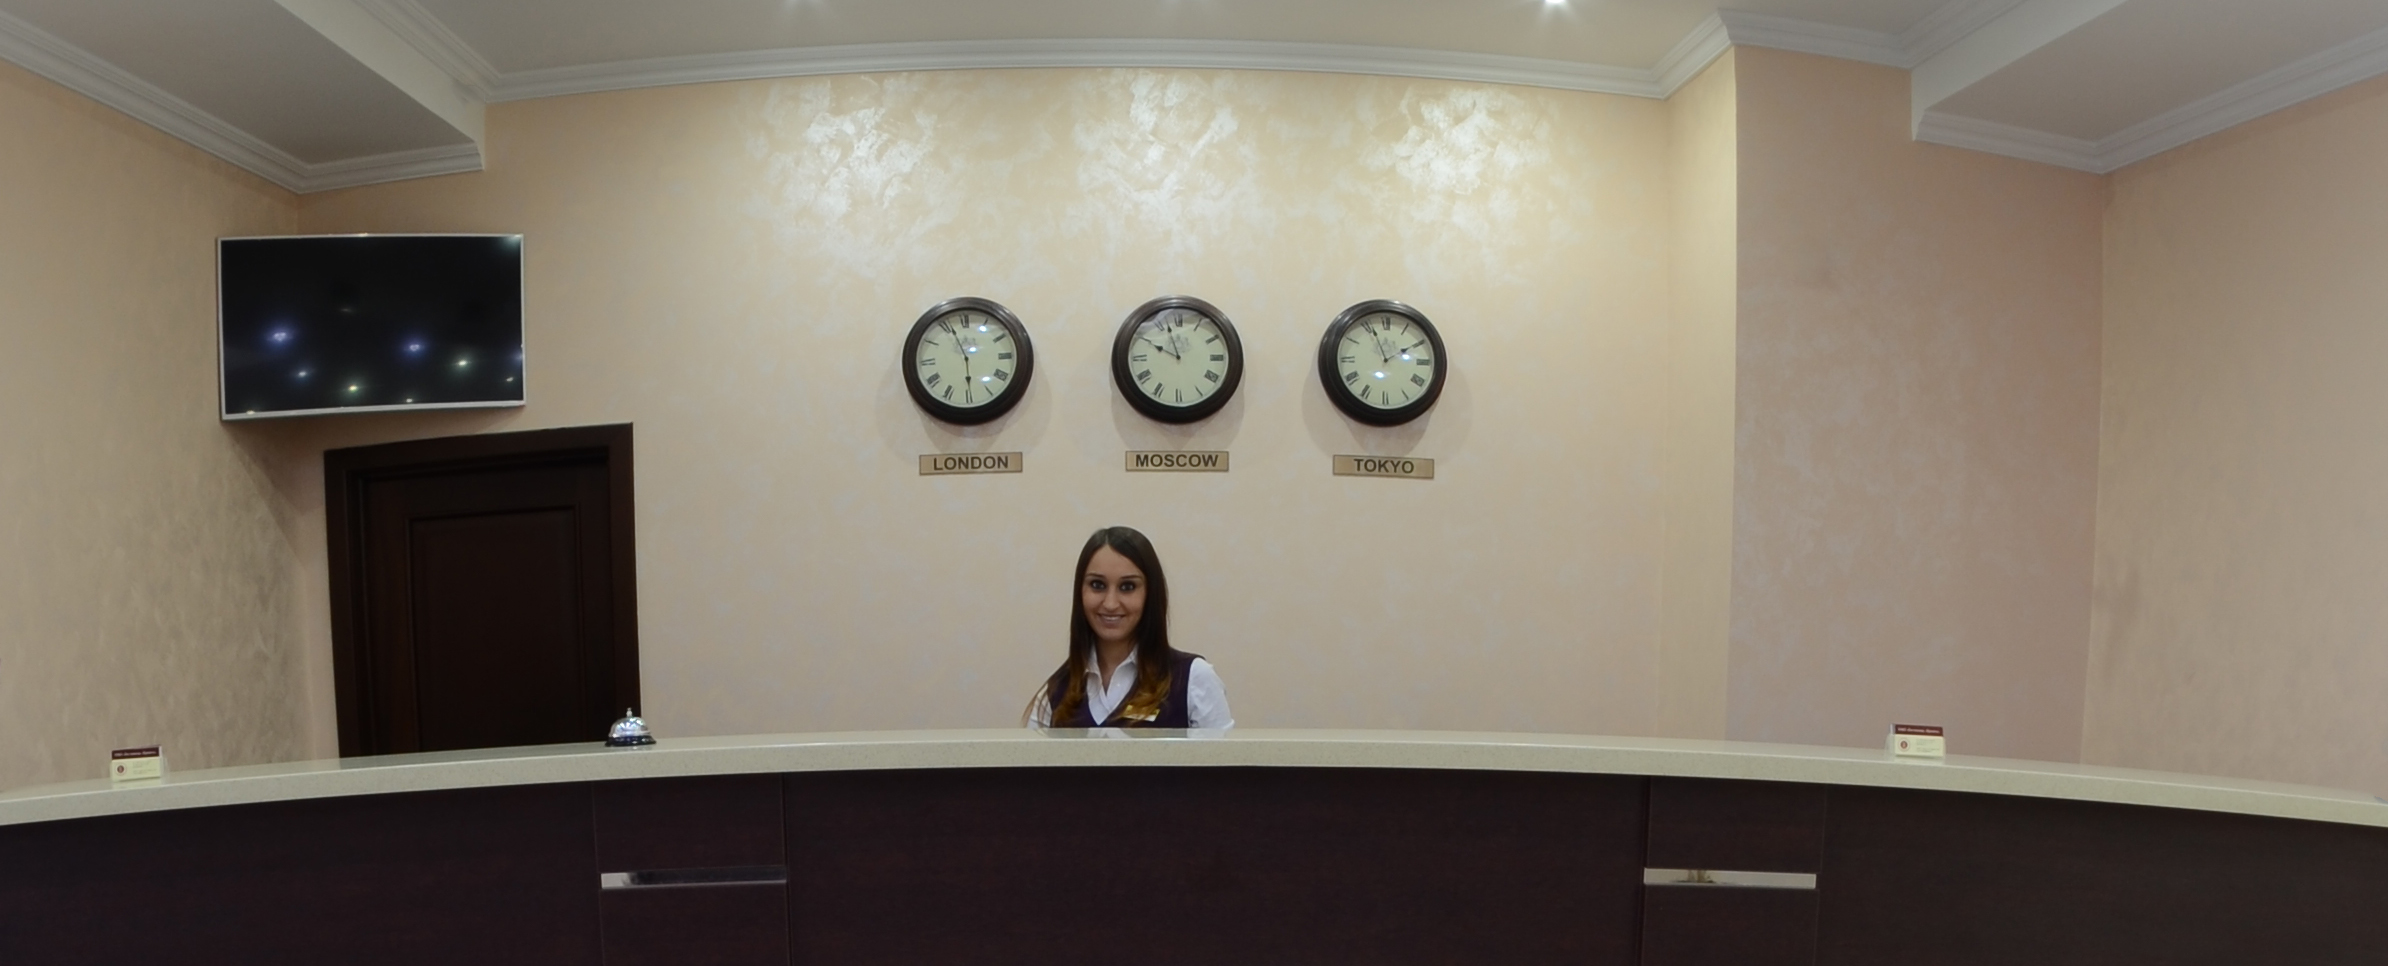 Брянск, гостиница